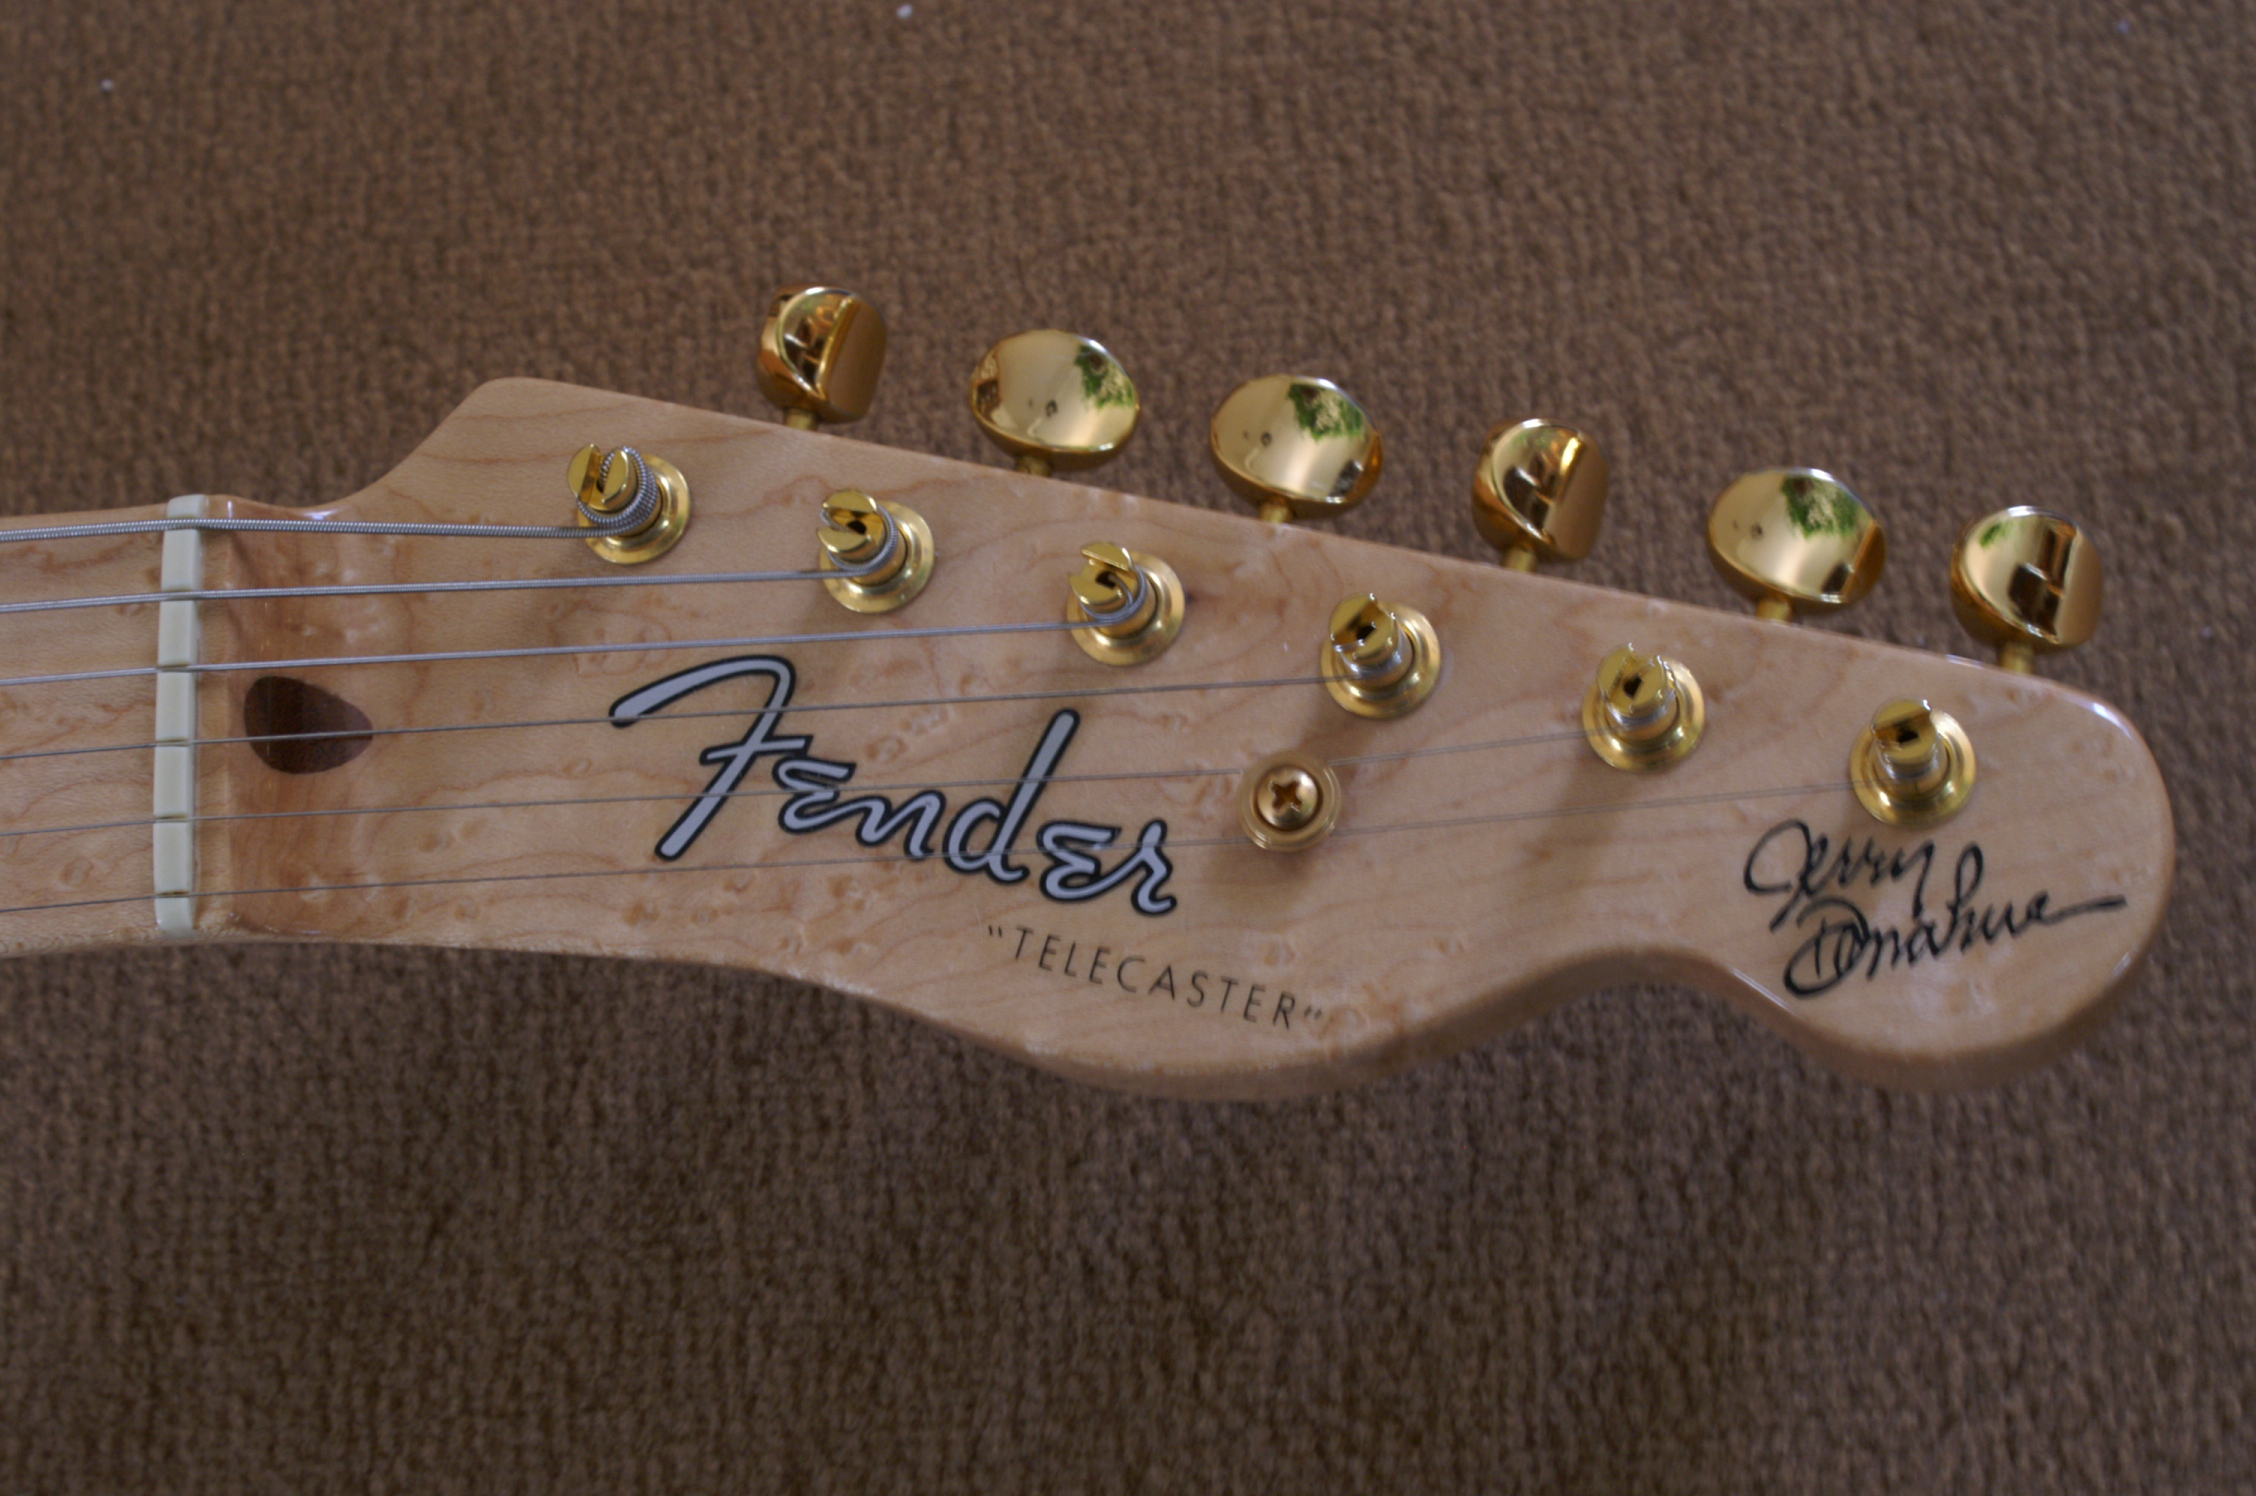 Fender Custom Shop Jerry Donahue Telecaster Wiring Diagram Audiofanzine 2256x1496